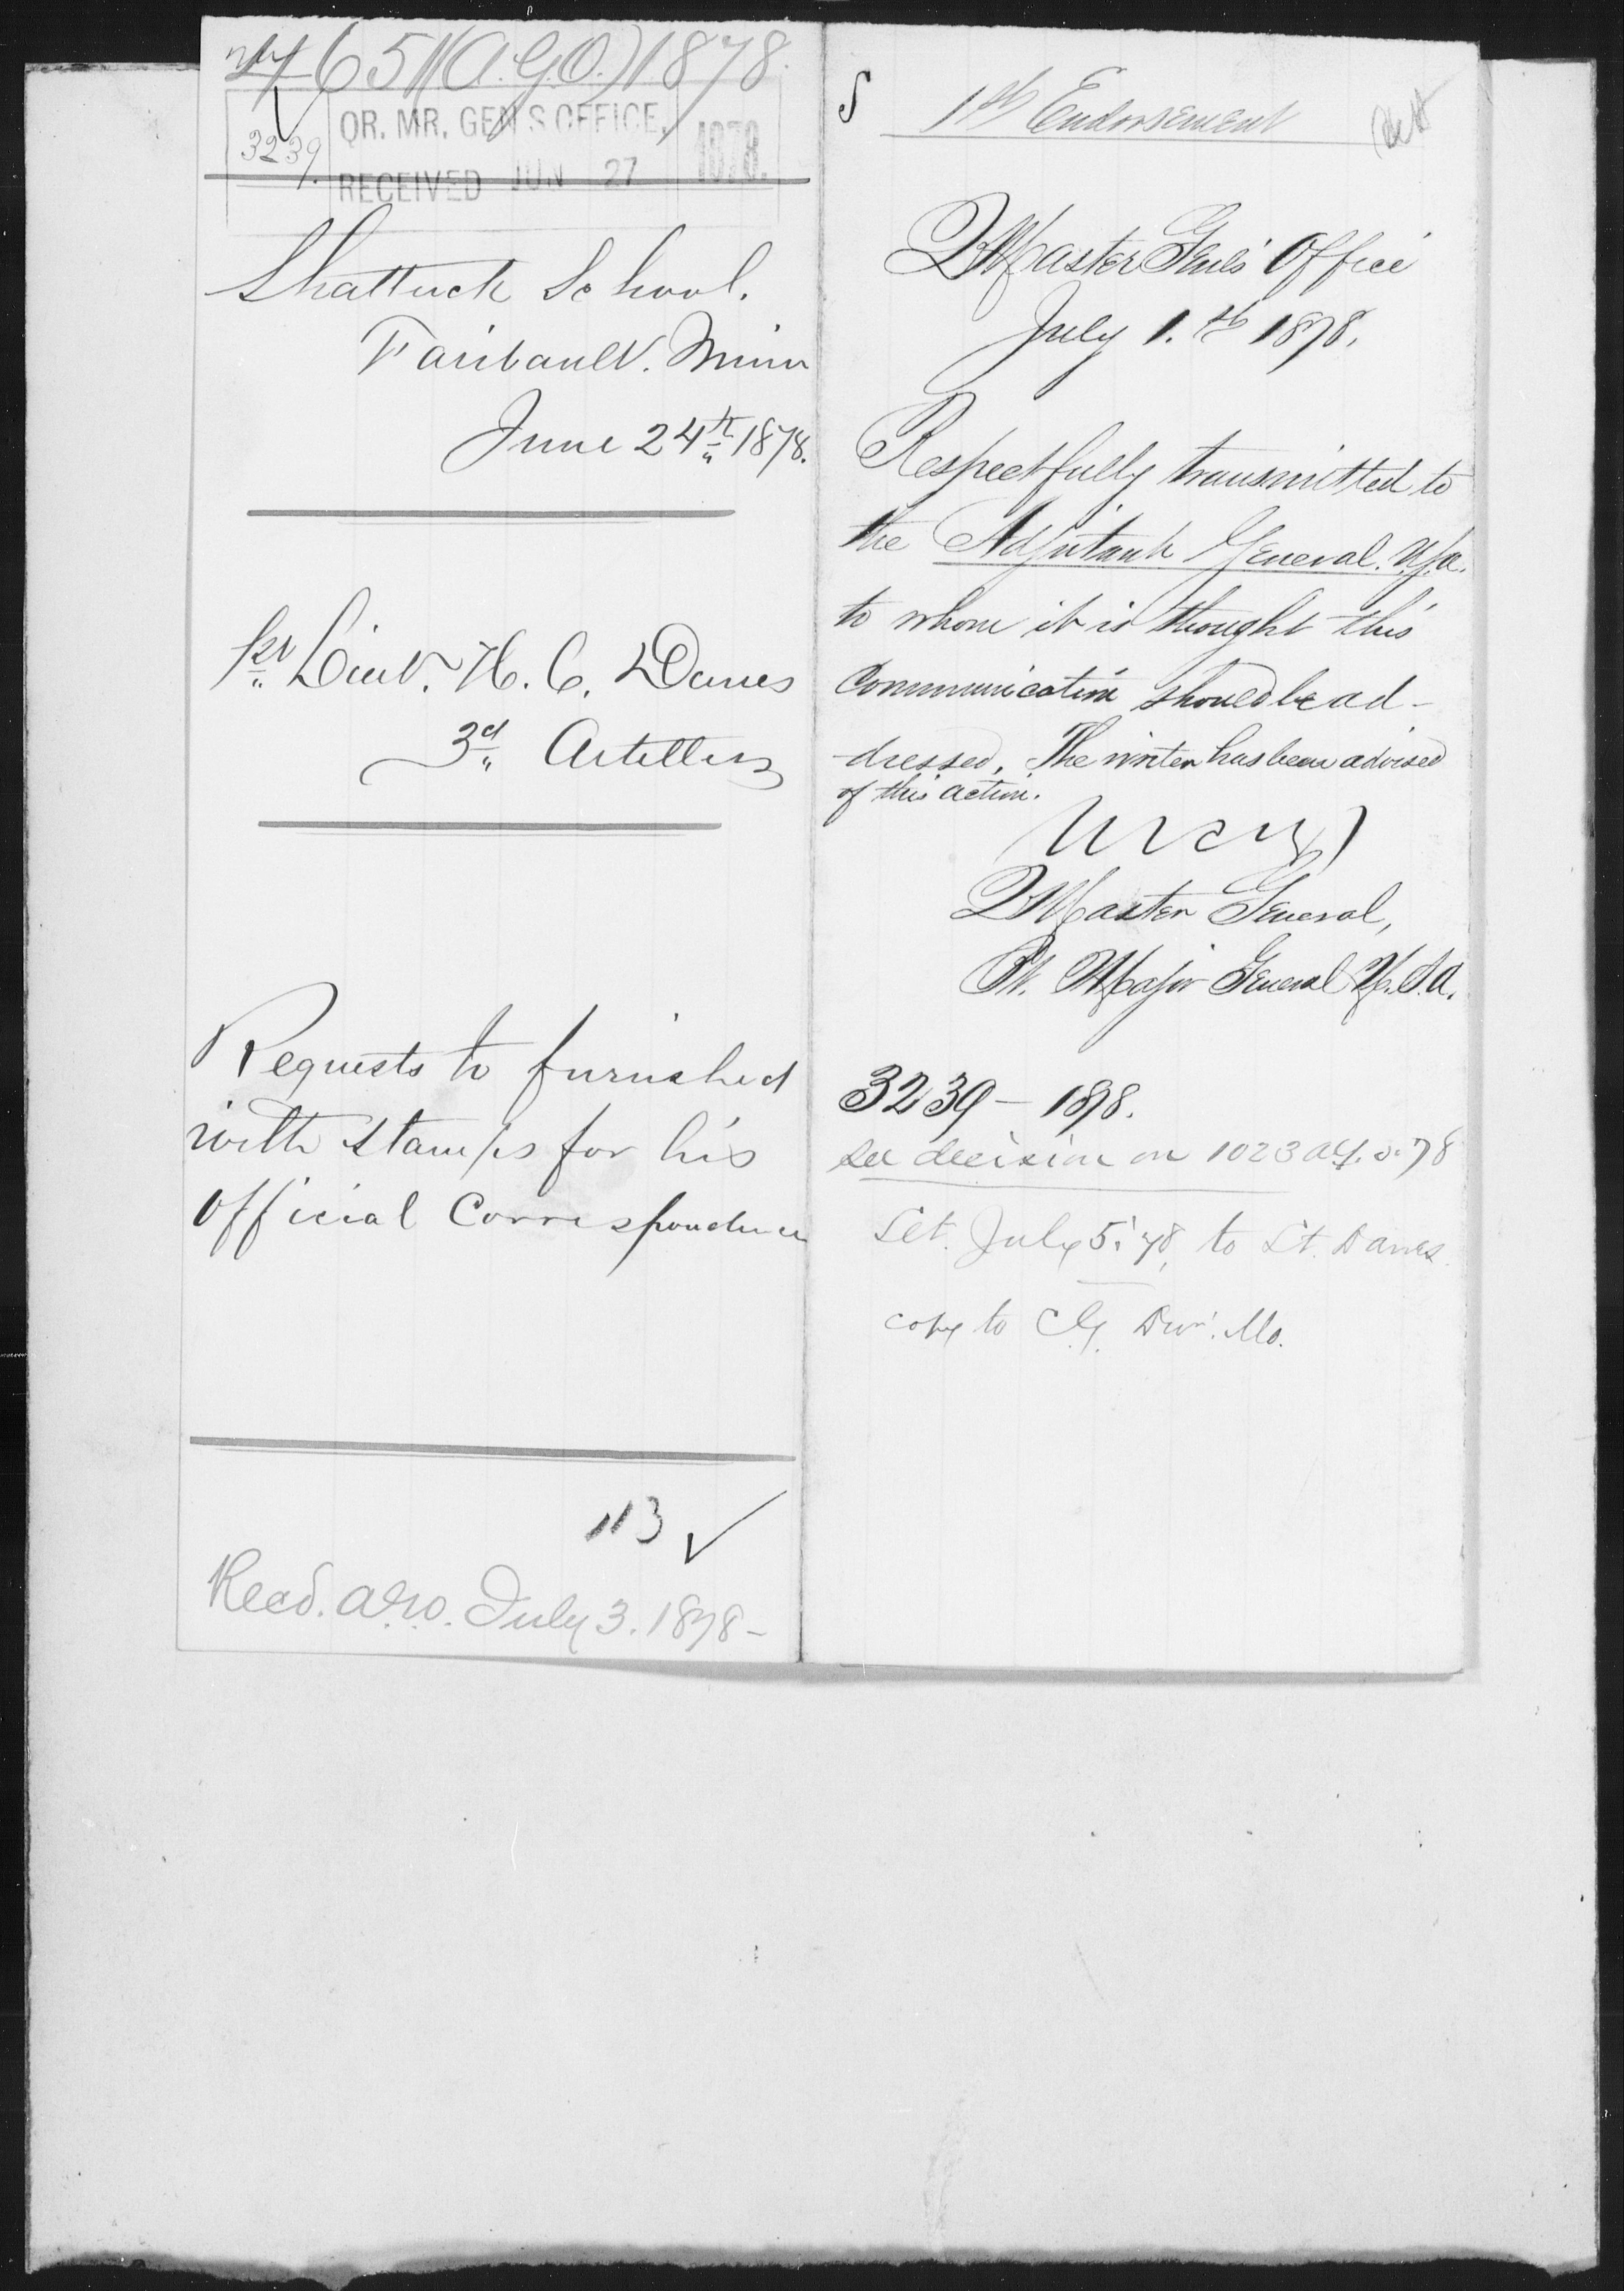 1878 - File No. 4651 (Danes, H C - Minnesota)